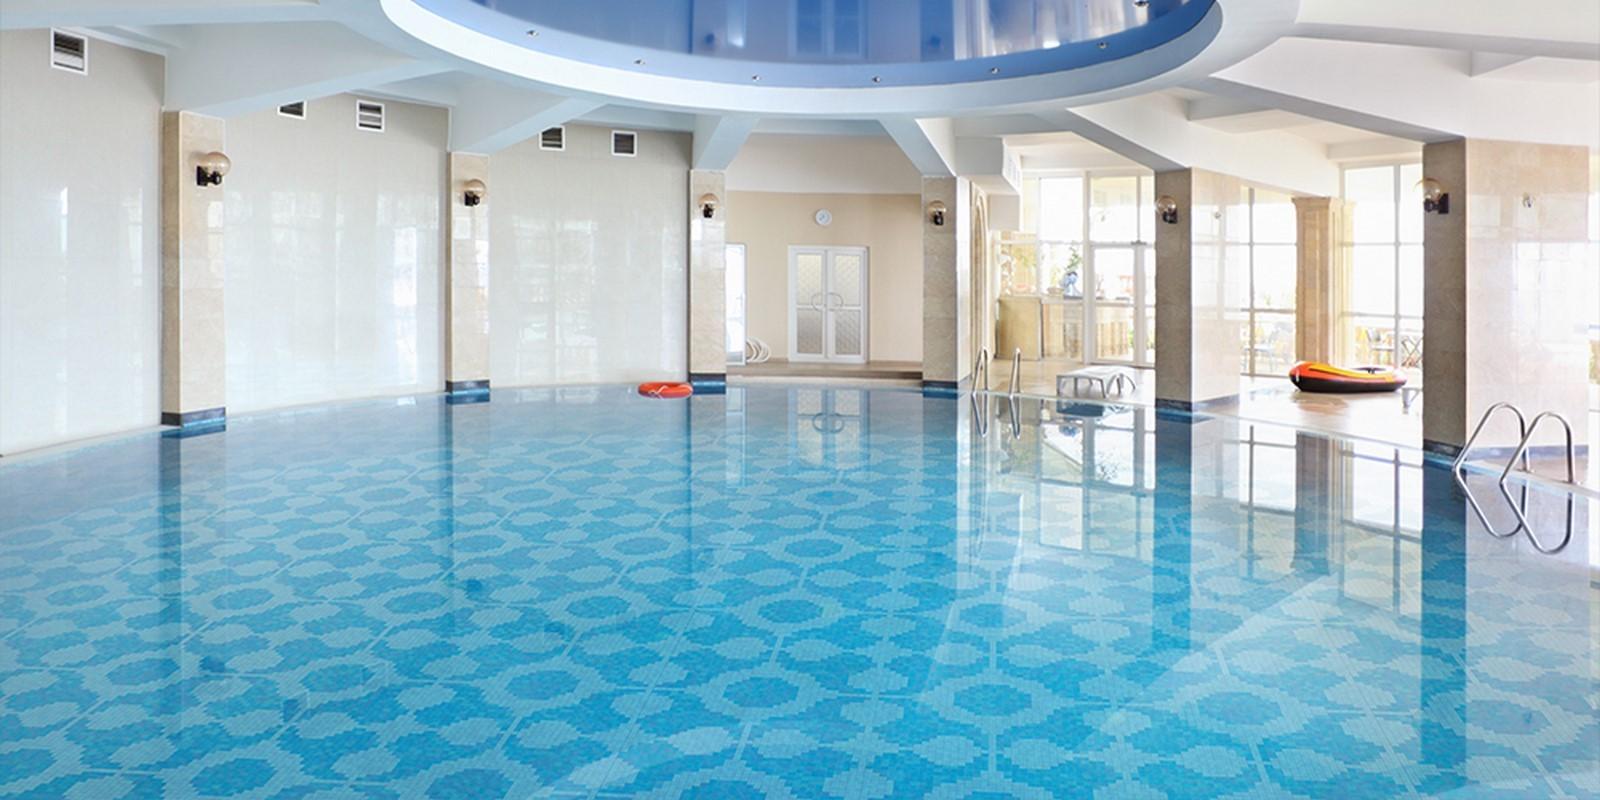 25 flooring patterns for Swimming Pools - Sheet24